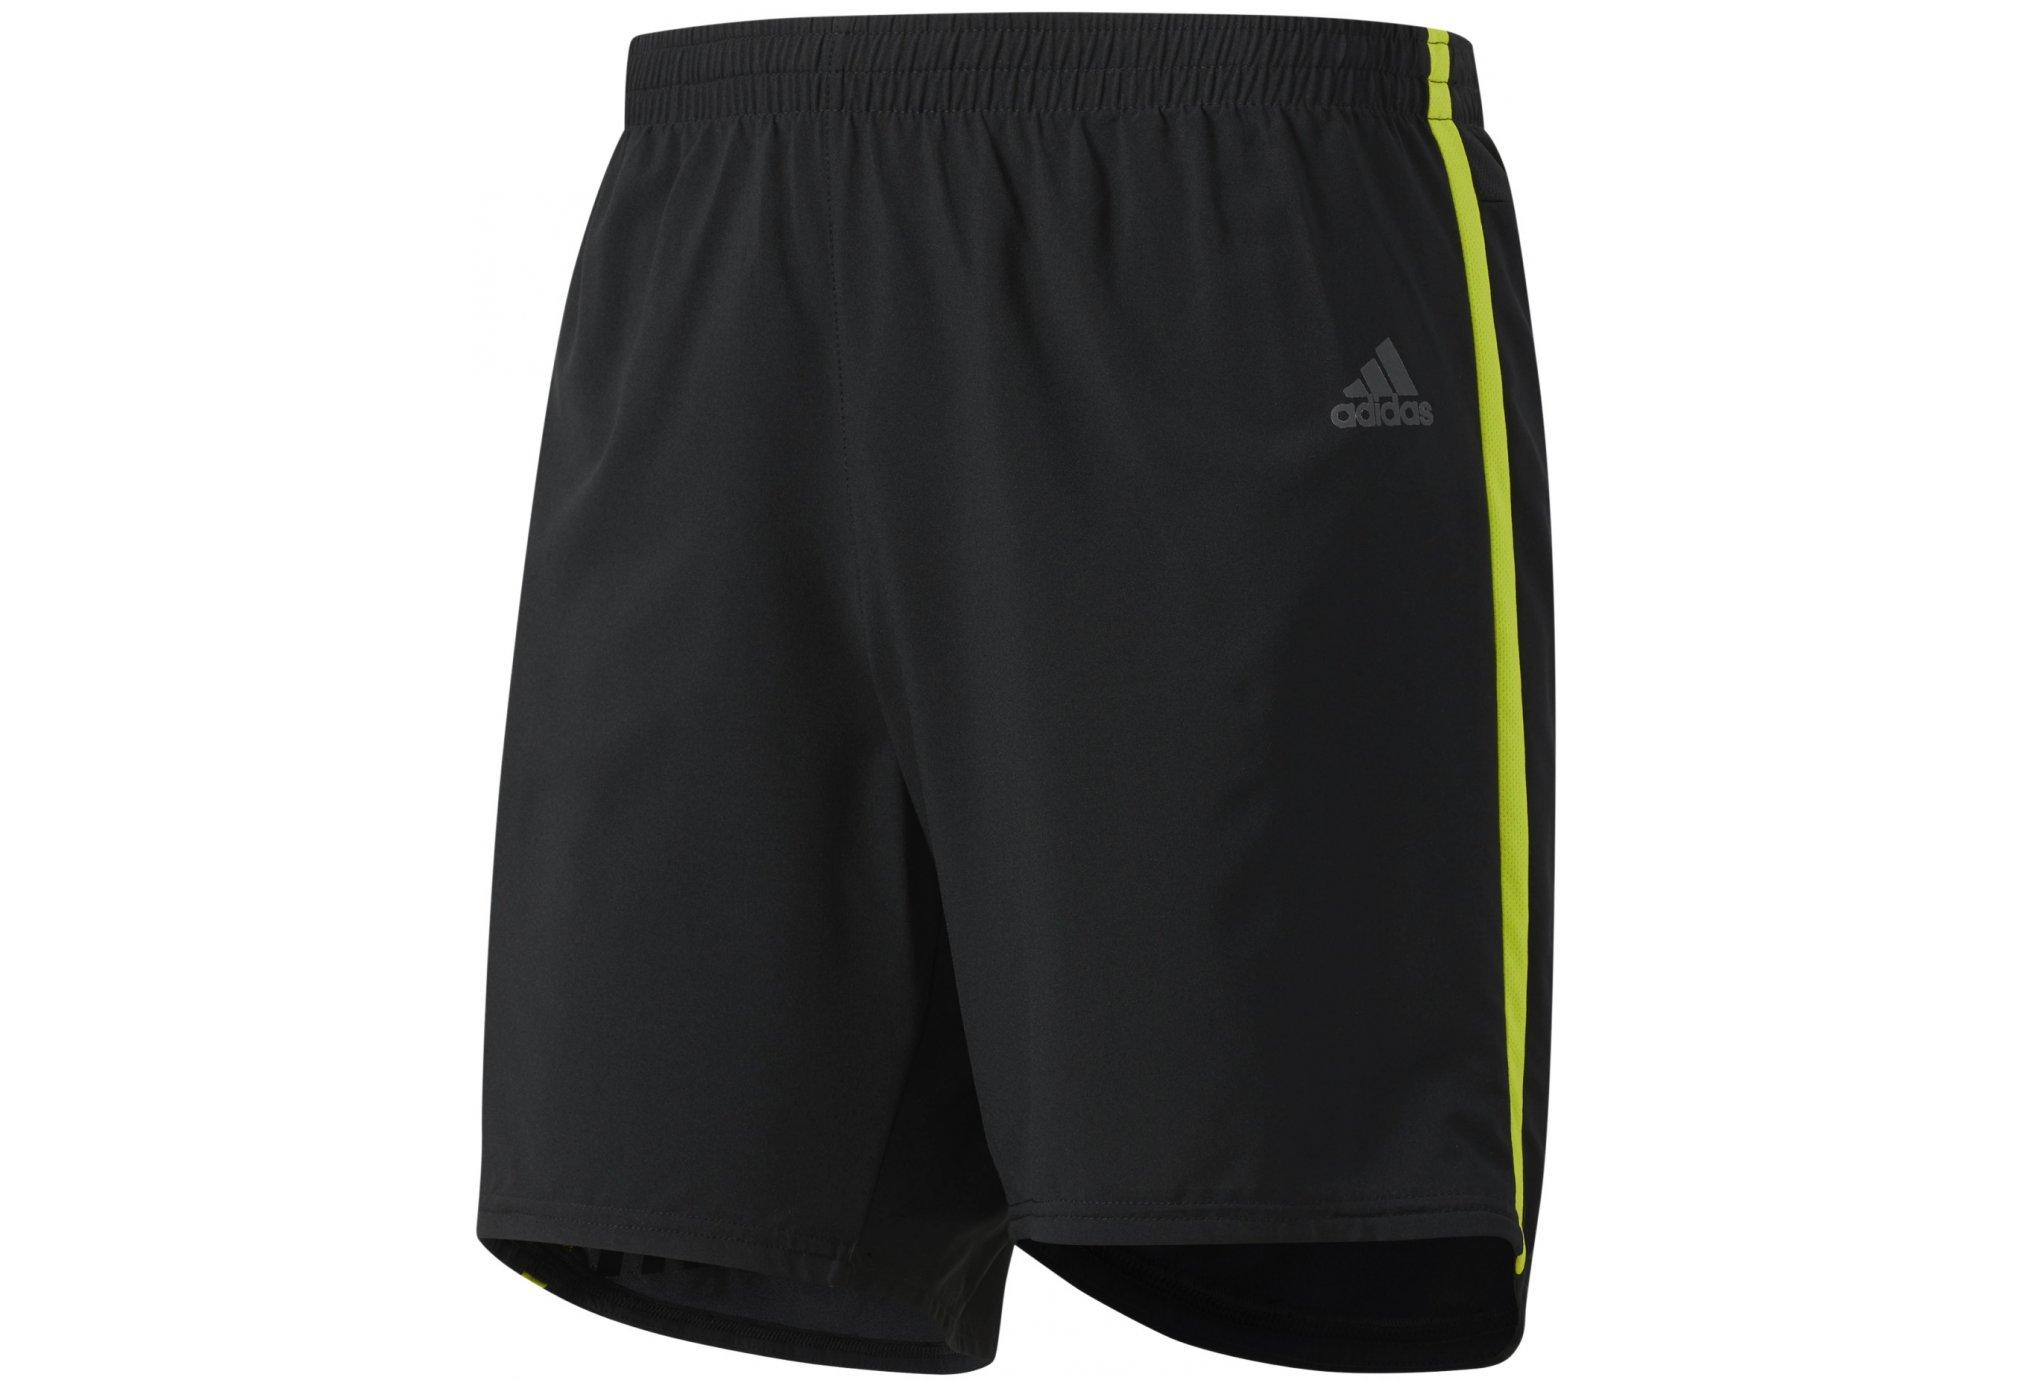 Adidas Response m vêtement running homme